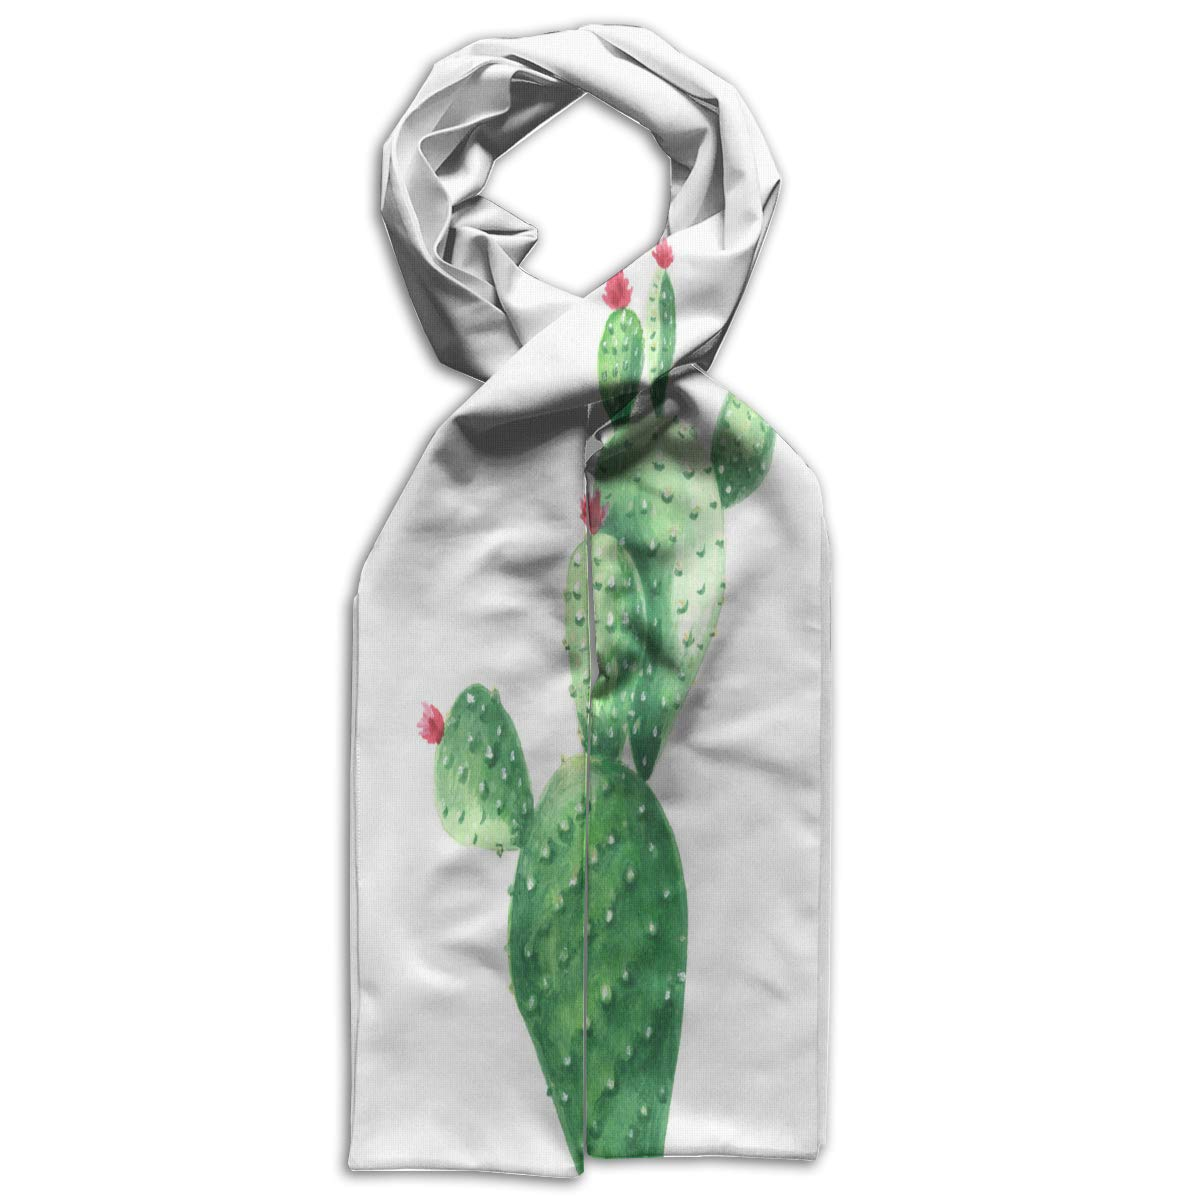 Kids Scarf Cartoon Christmas Trees Scarves Winter Warm Shawl Wrap For Teen